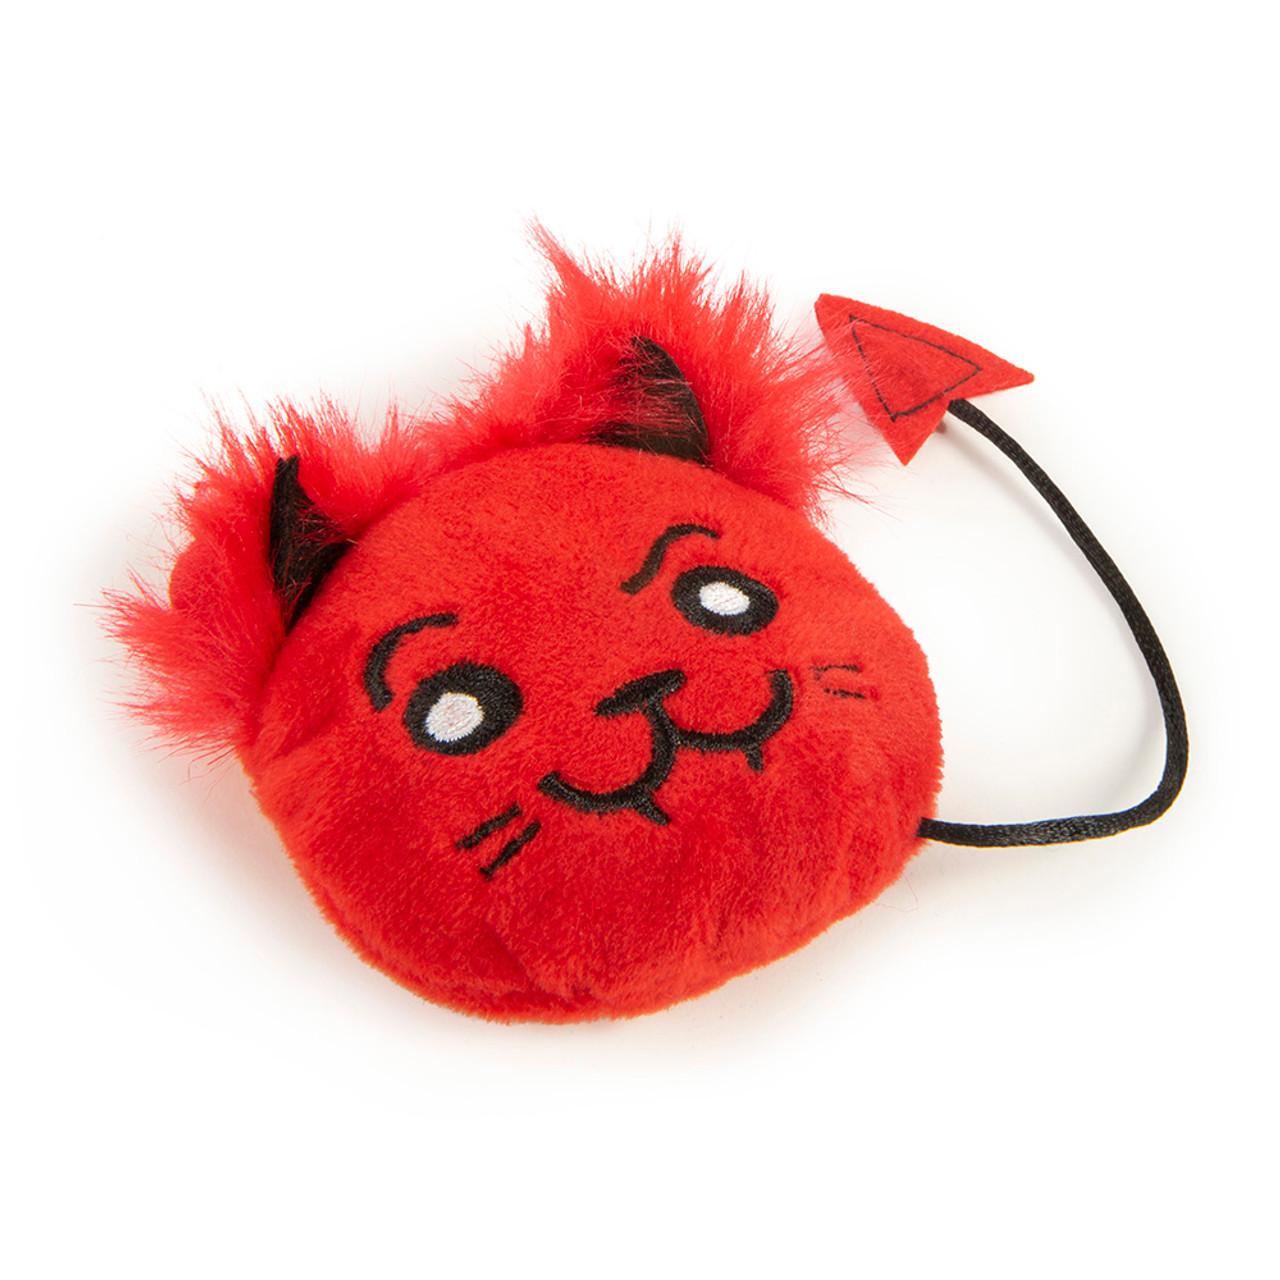 PetLinks Lil Devil Catnip Filled Plush Cat Toy